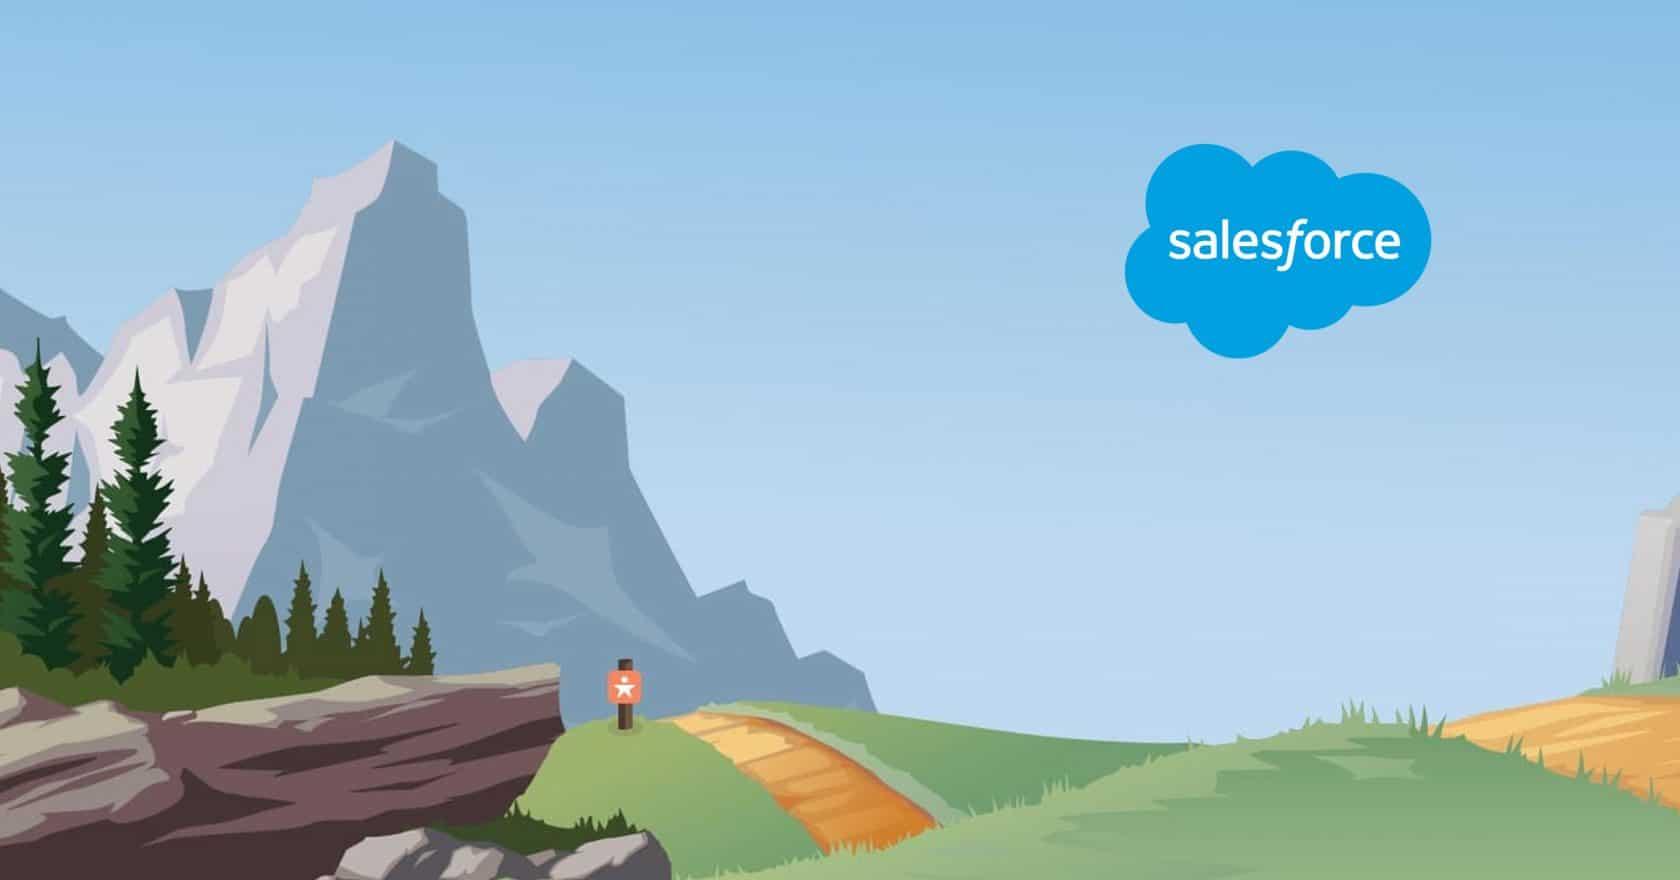 Top features of Salesforce 2019